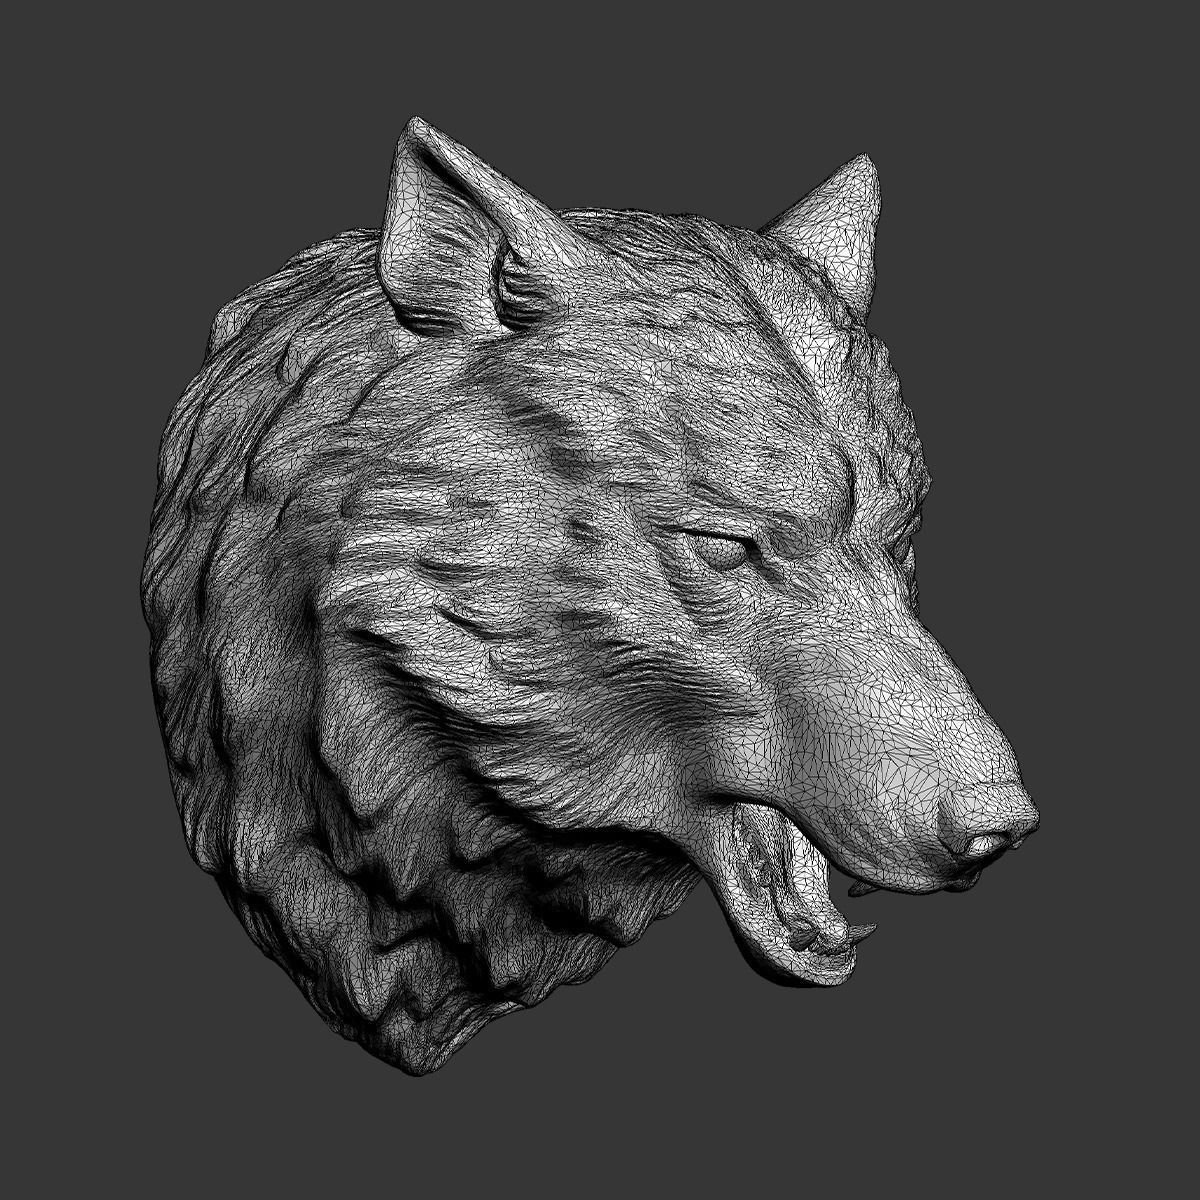 Wolf Head Sculpture 3D Model 3D Printable .obj .stl